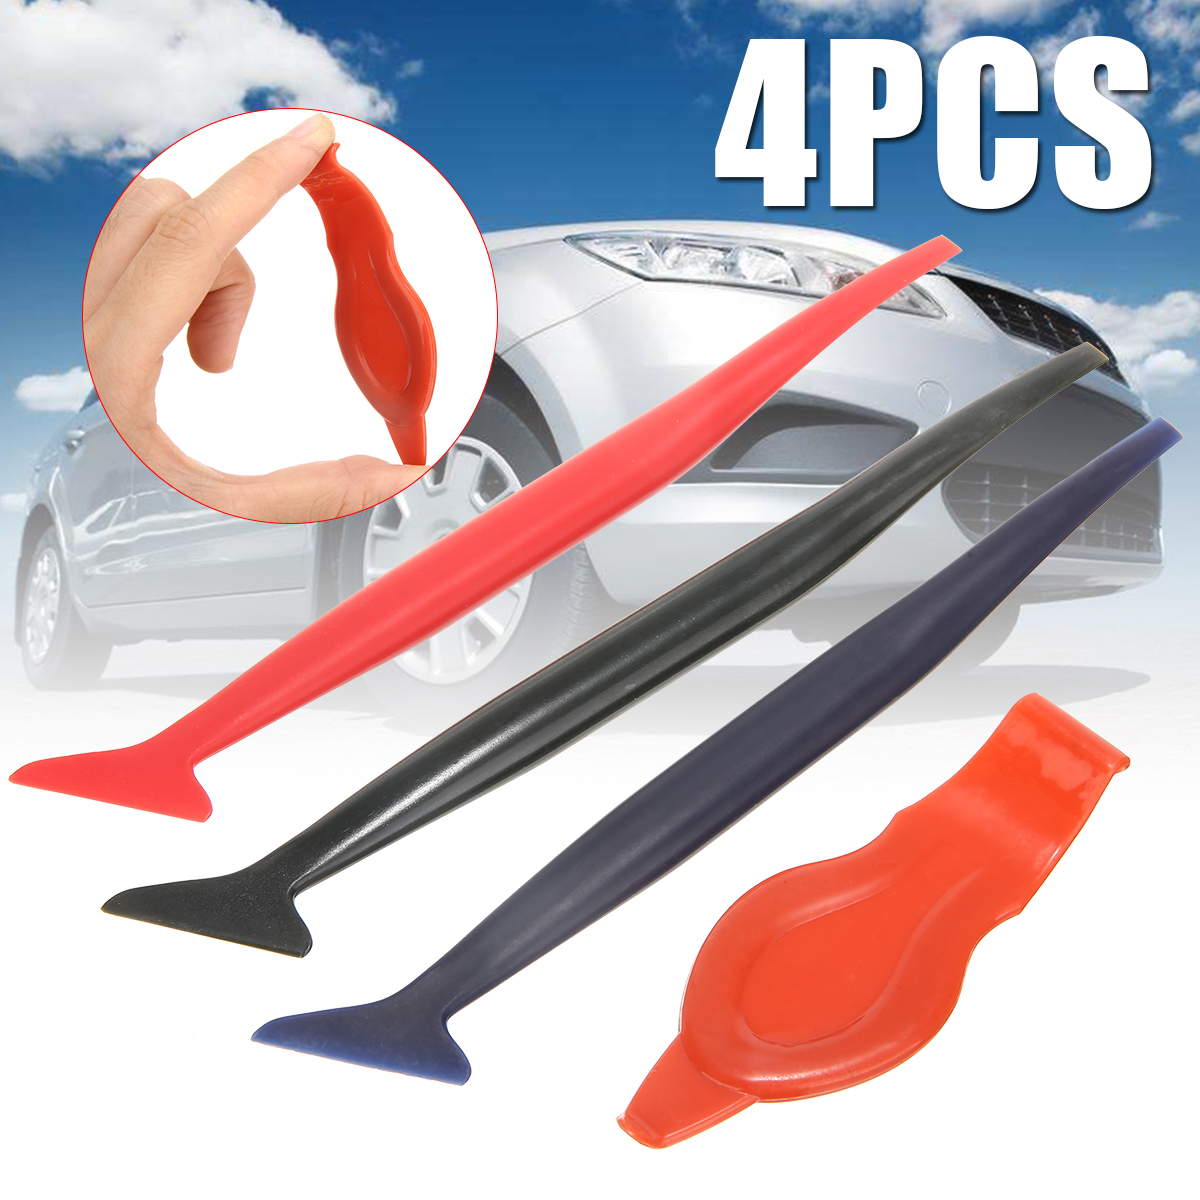 Mayitr 4pcs Micro Squeegee Set Vinyl Car Film Sticker Tint Wrap Tuck Tool Kit for Installing Vehicle Wraps Auto Sticker